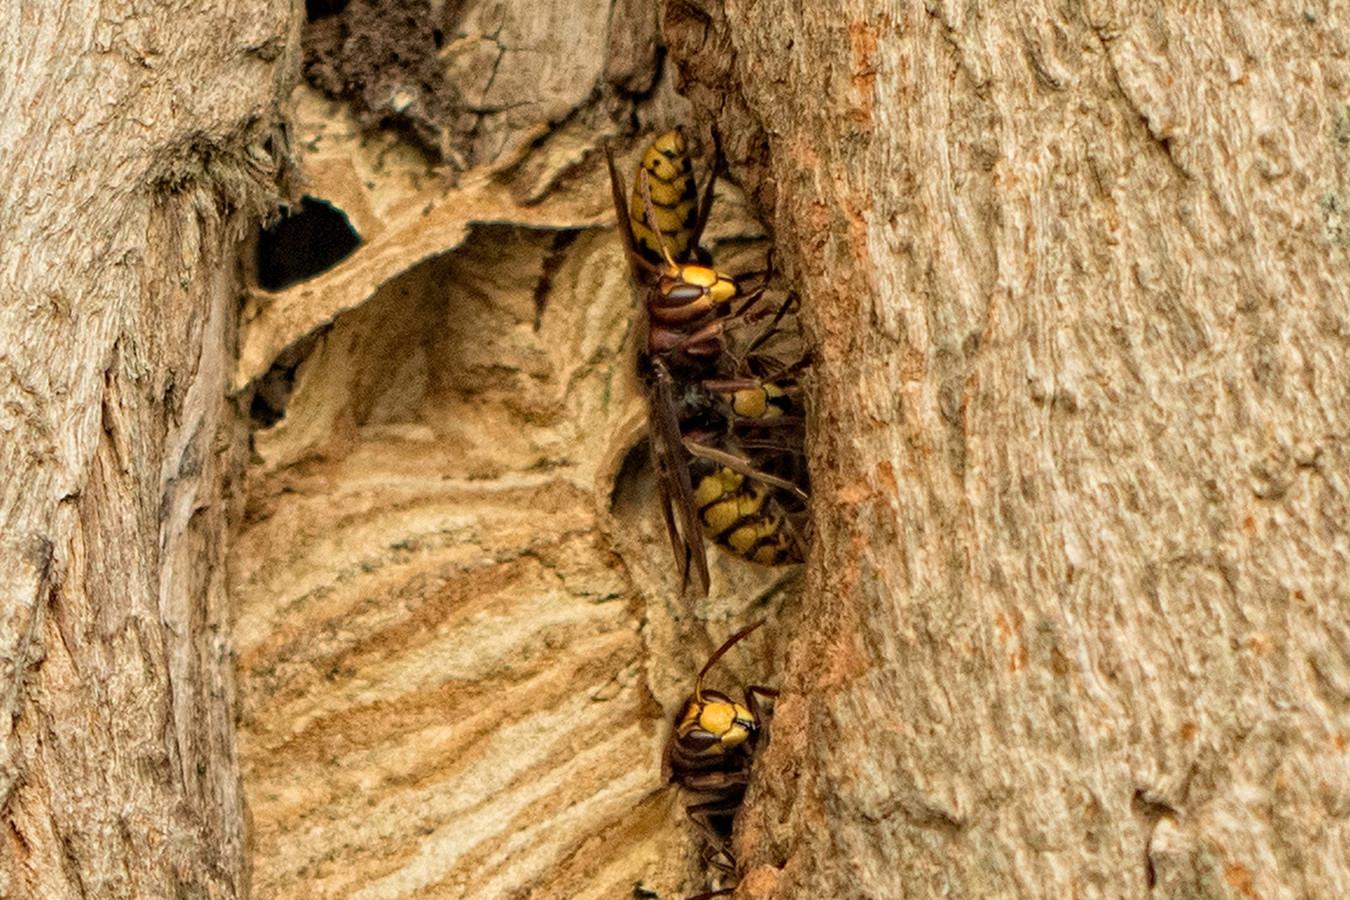 Nest van hoornaars in acacia op Huis Ter Heide